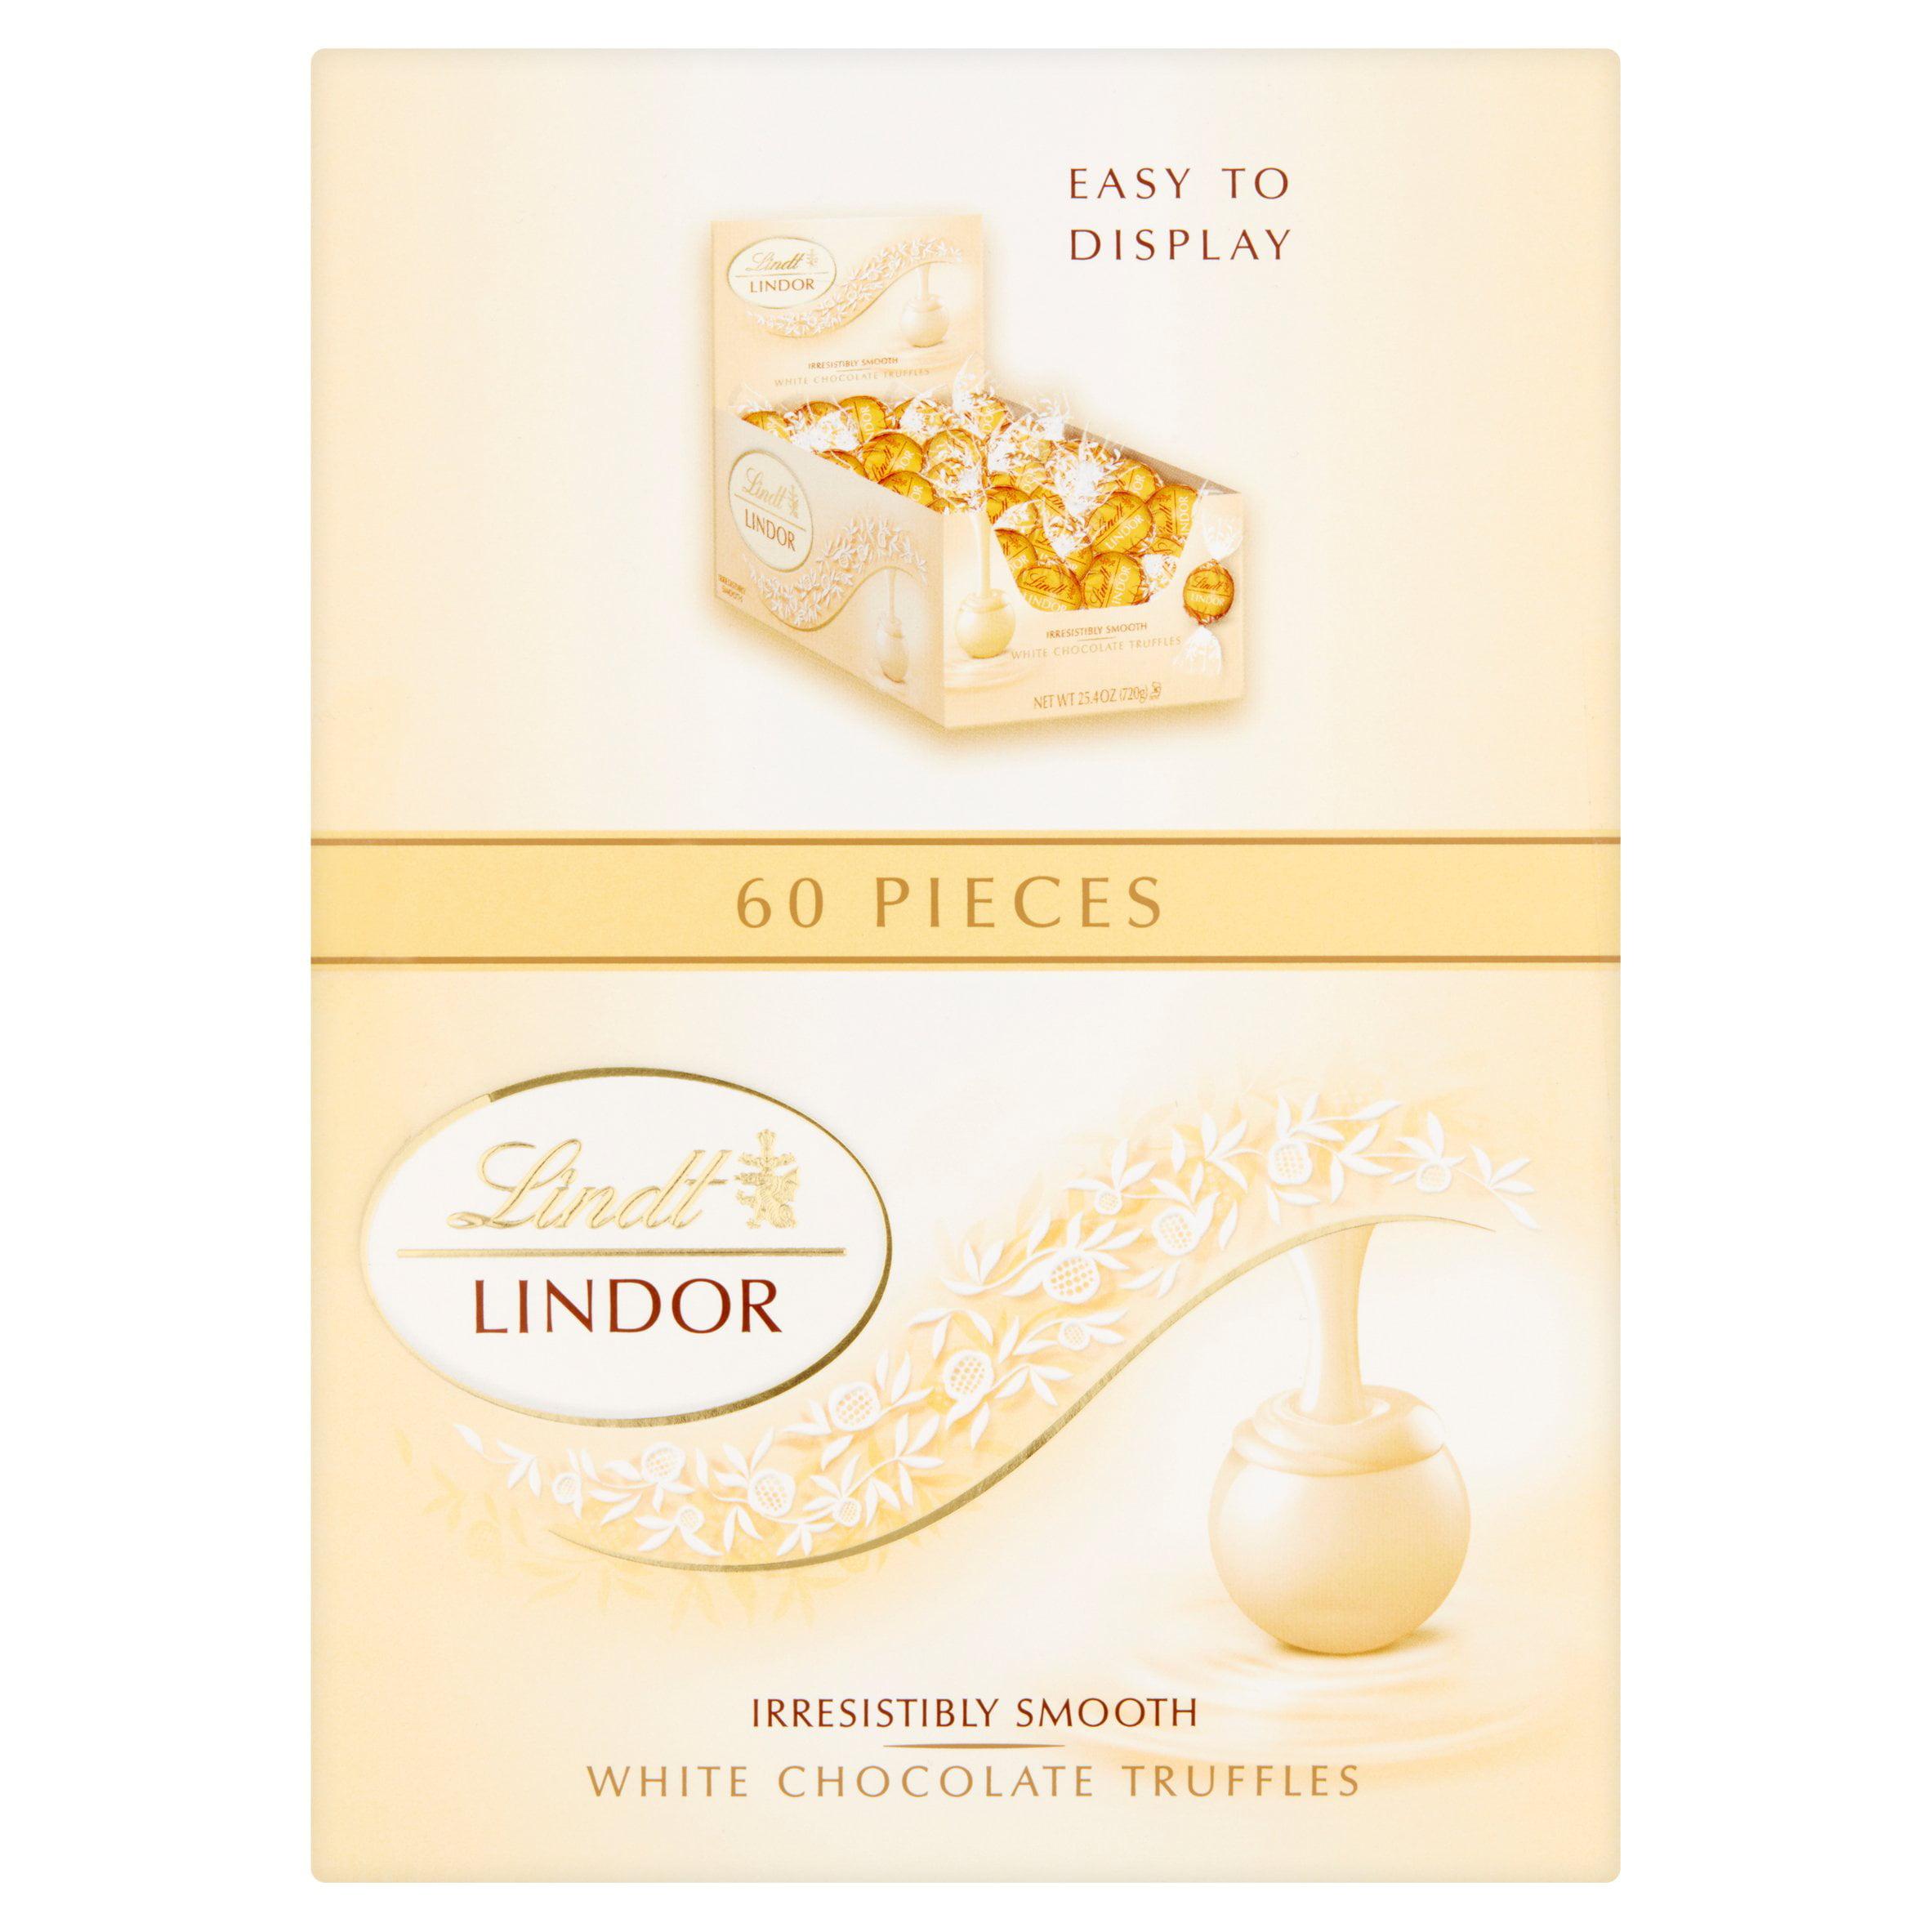 Lindt Lindor White Chocolate Truffles, 25.4 oz, 60 count